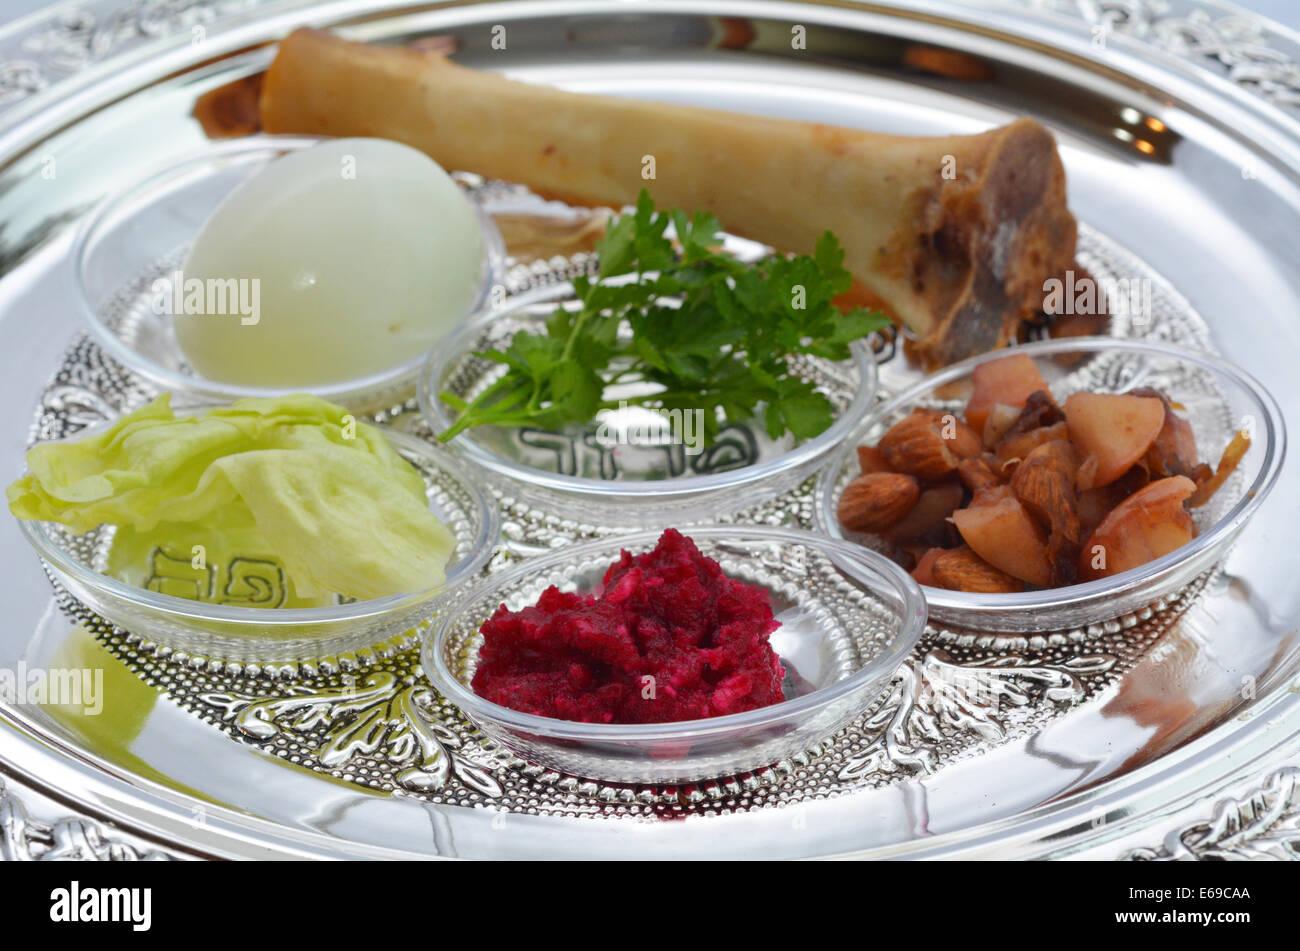 Passover Seder Plate Symbolic Food Stock Photos Passover Seder